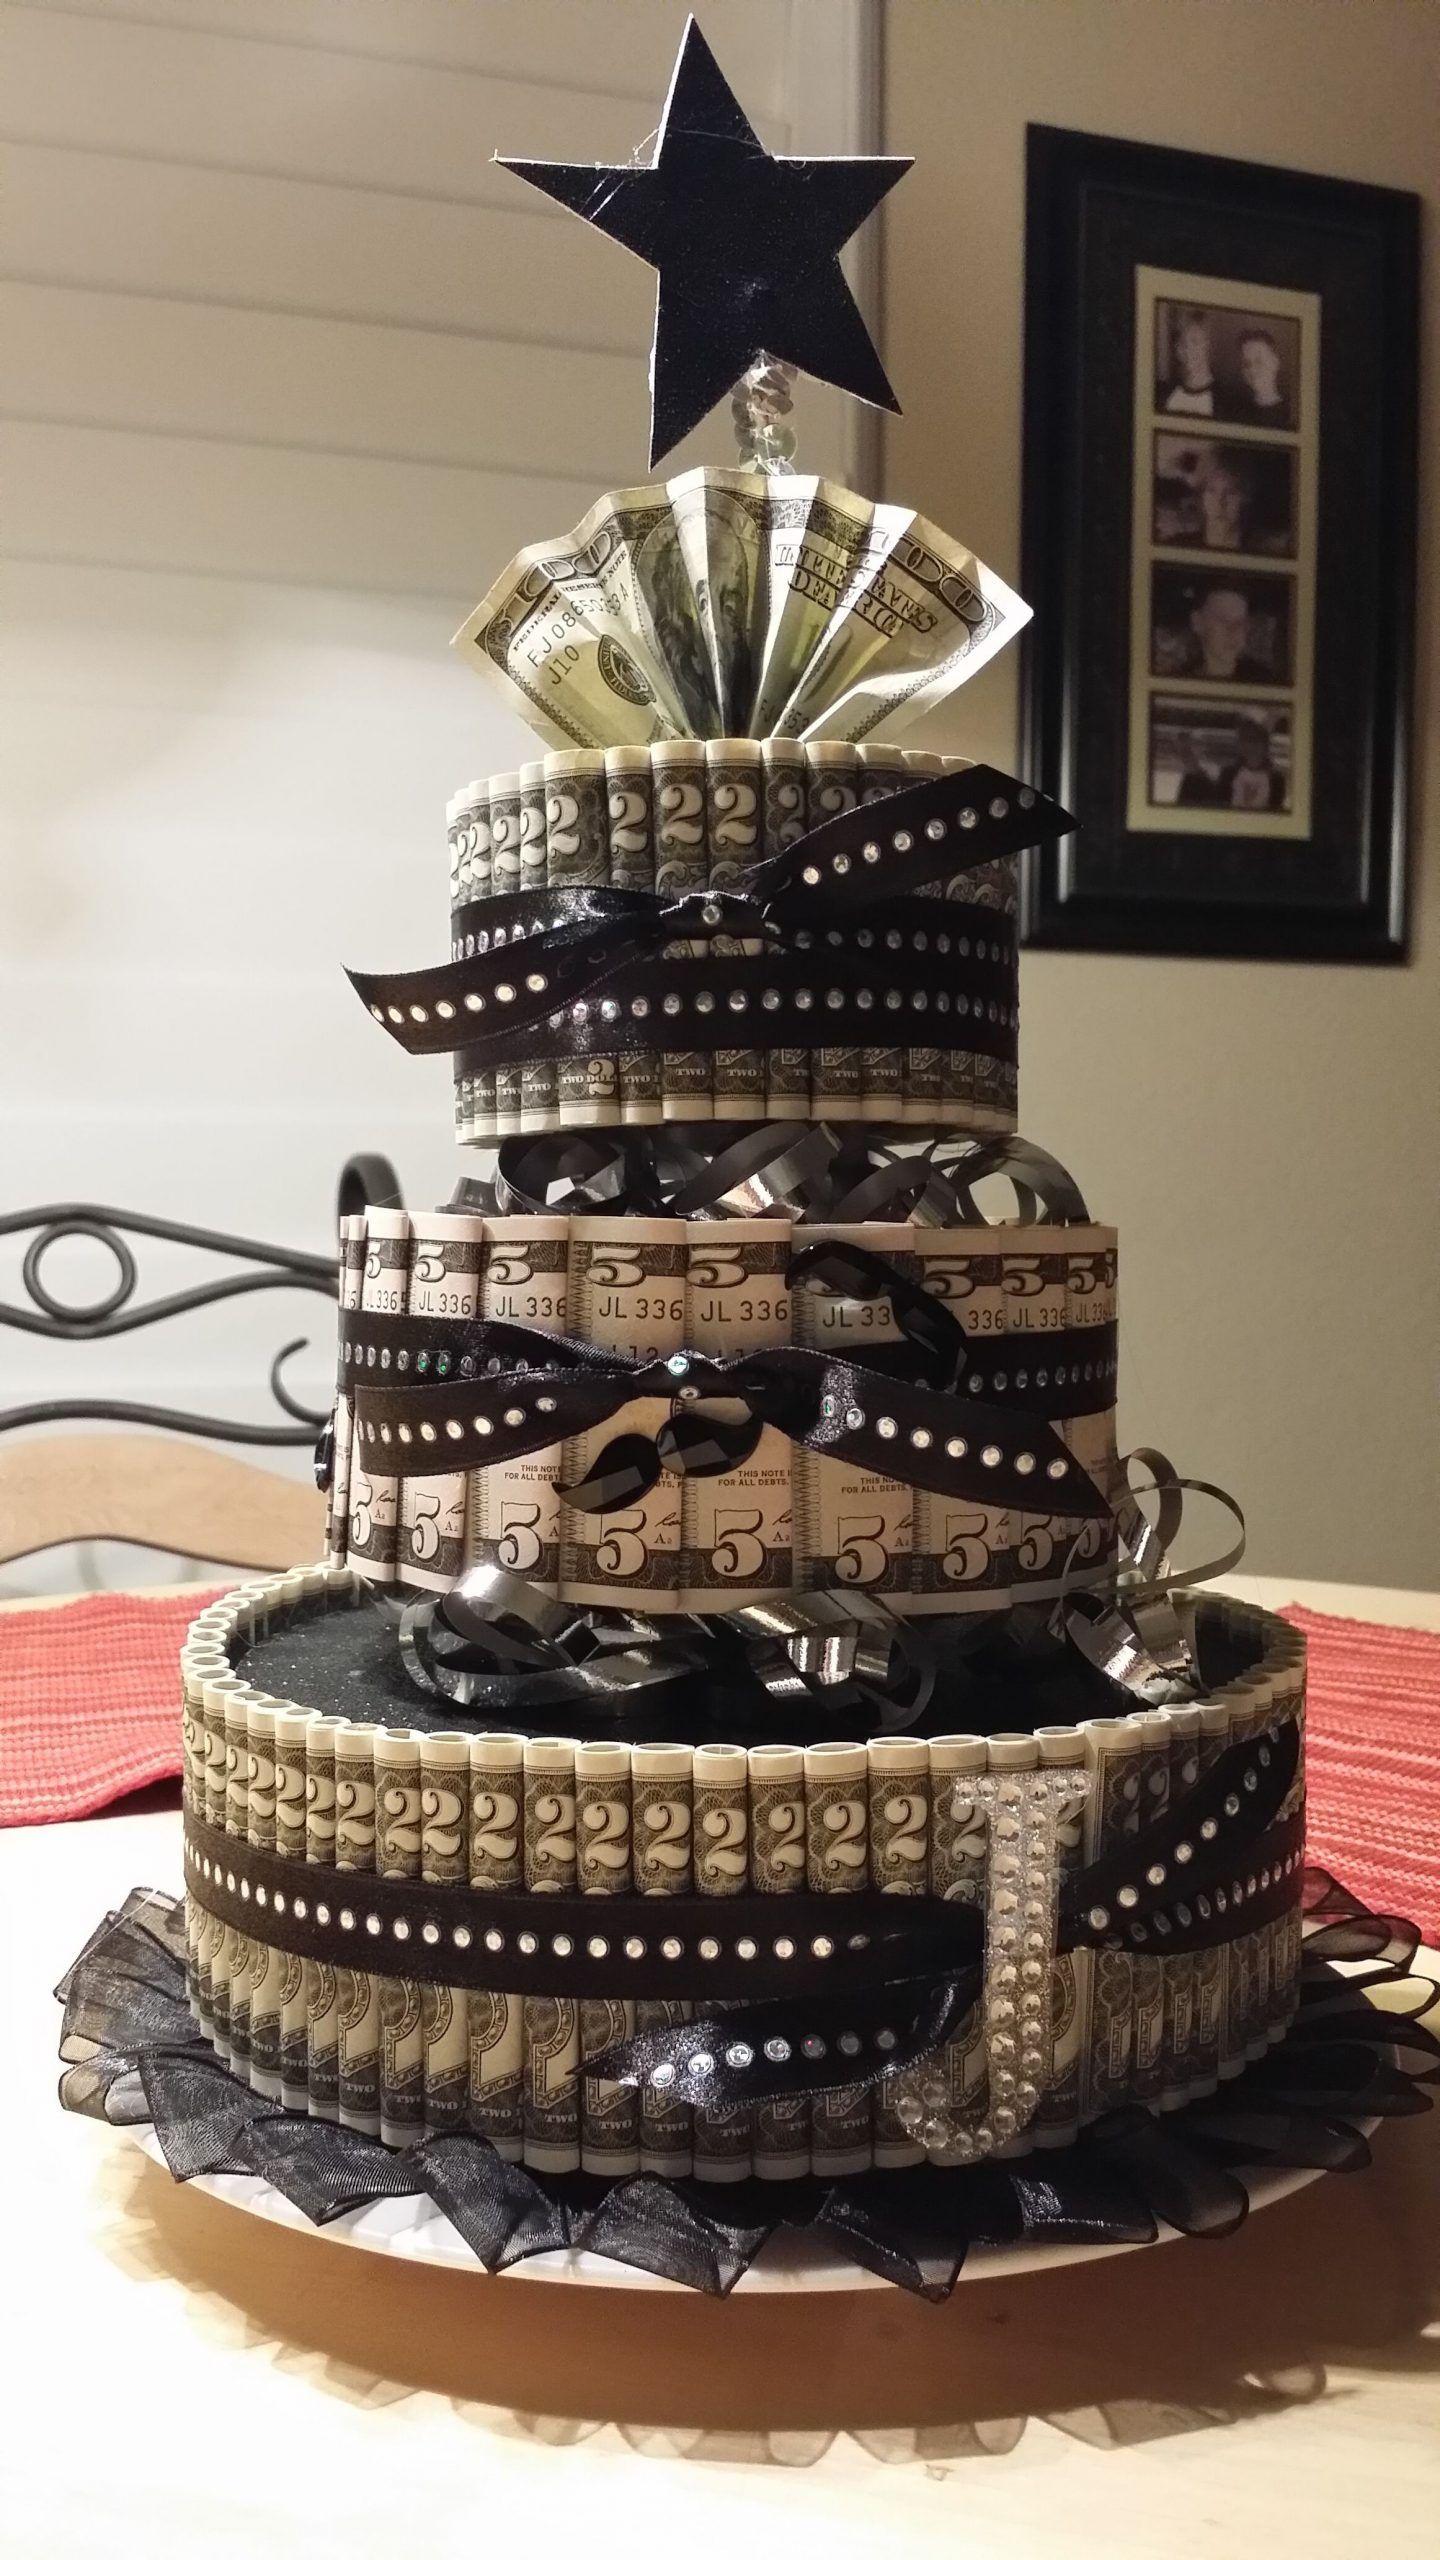 Birthday Cake Made Of Money